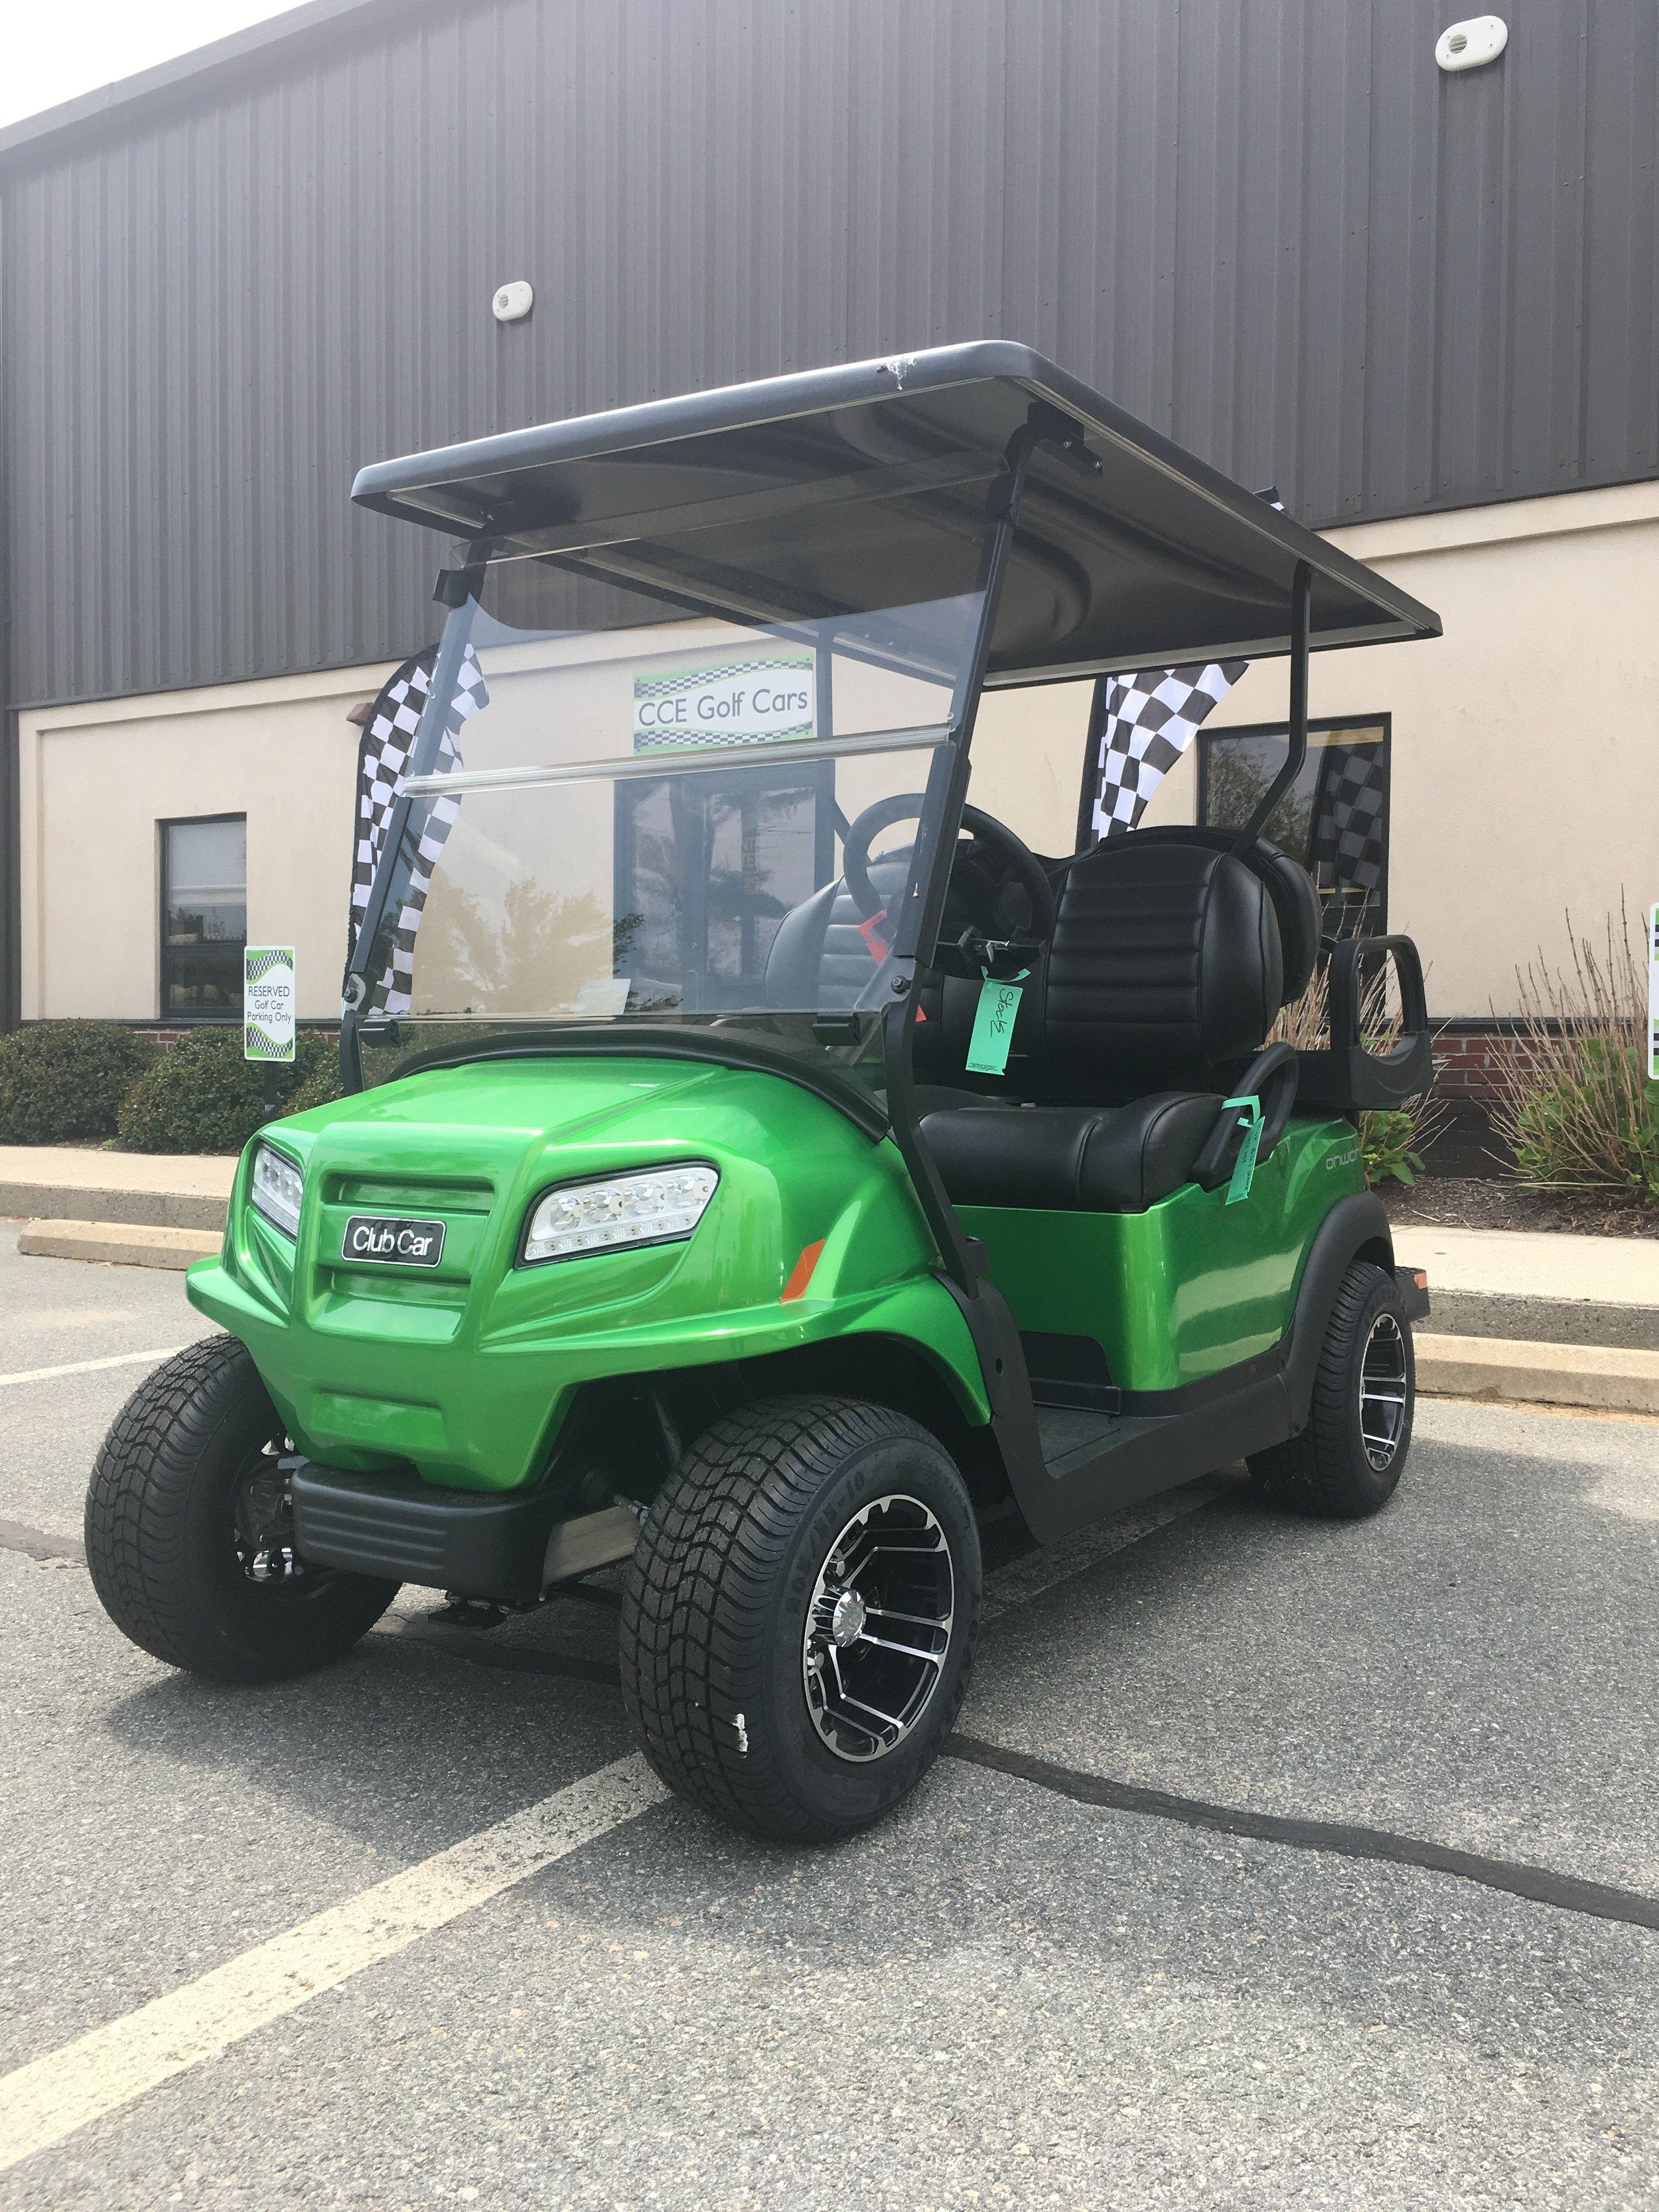 New 2019 Gas Synergy Green 4-Passenger Club Car Onward — CCE Golf Cars